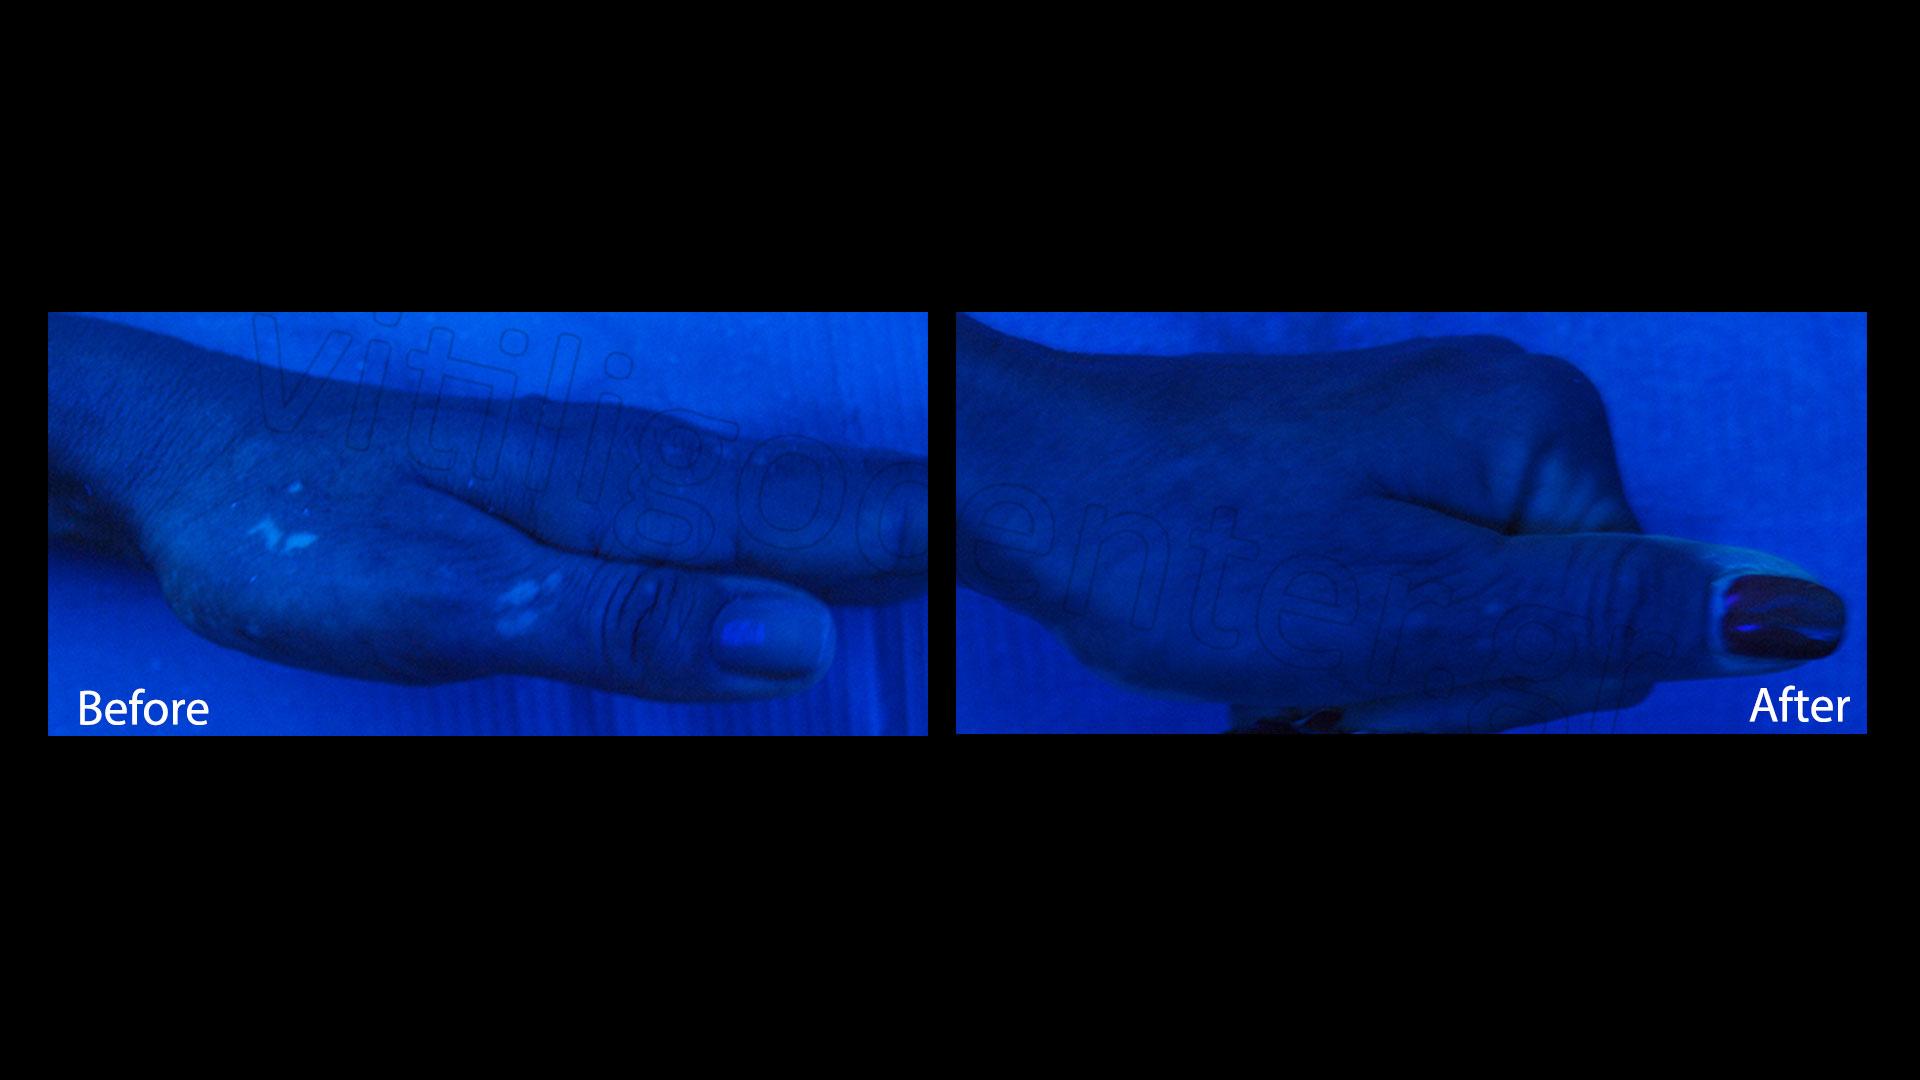 Medical cases of vitiligo | Vitiligo Center - Psychodermatologic ... for Wood Lamp Vitiligo  192sfw